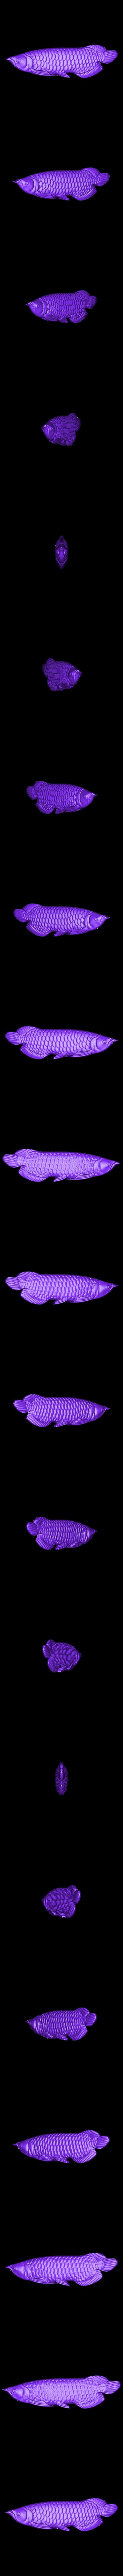 Golden_dragon_fish.stl Download free STL file arowana • 3D print design, stronghero3d